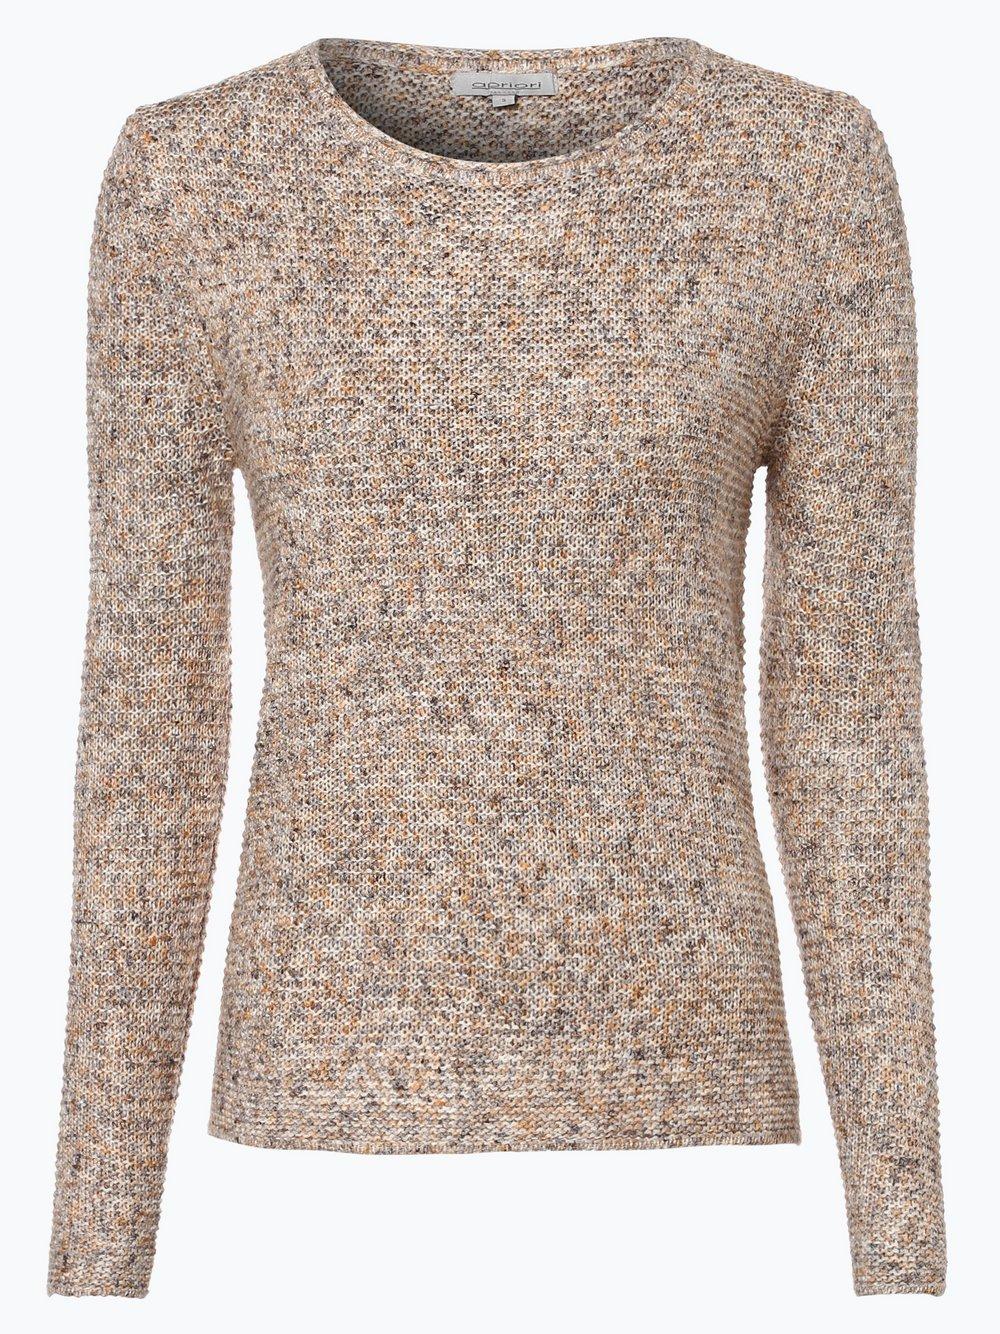 the latest 6e4a2 fa397 Apriori Damen Pullover mit Leinen-Anteil online kaufen ...